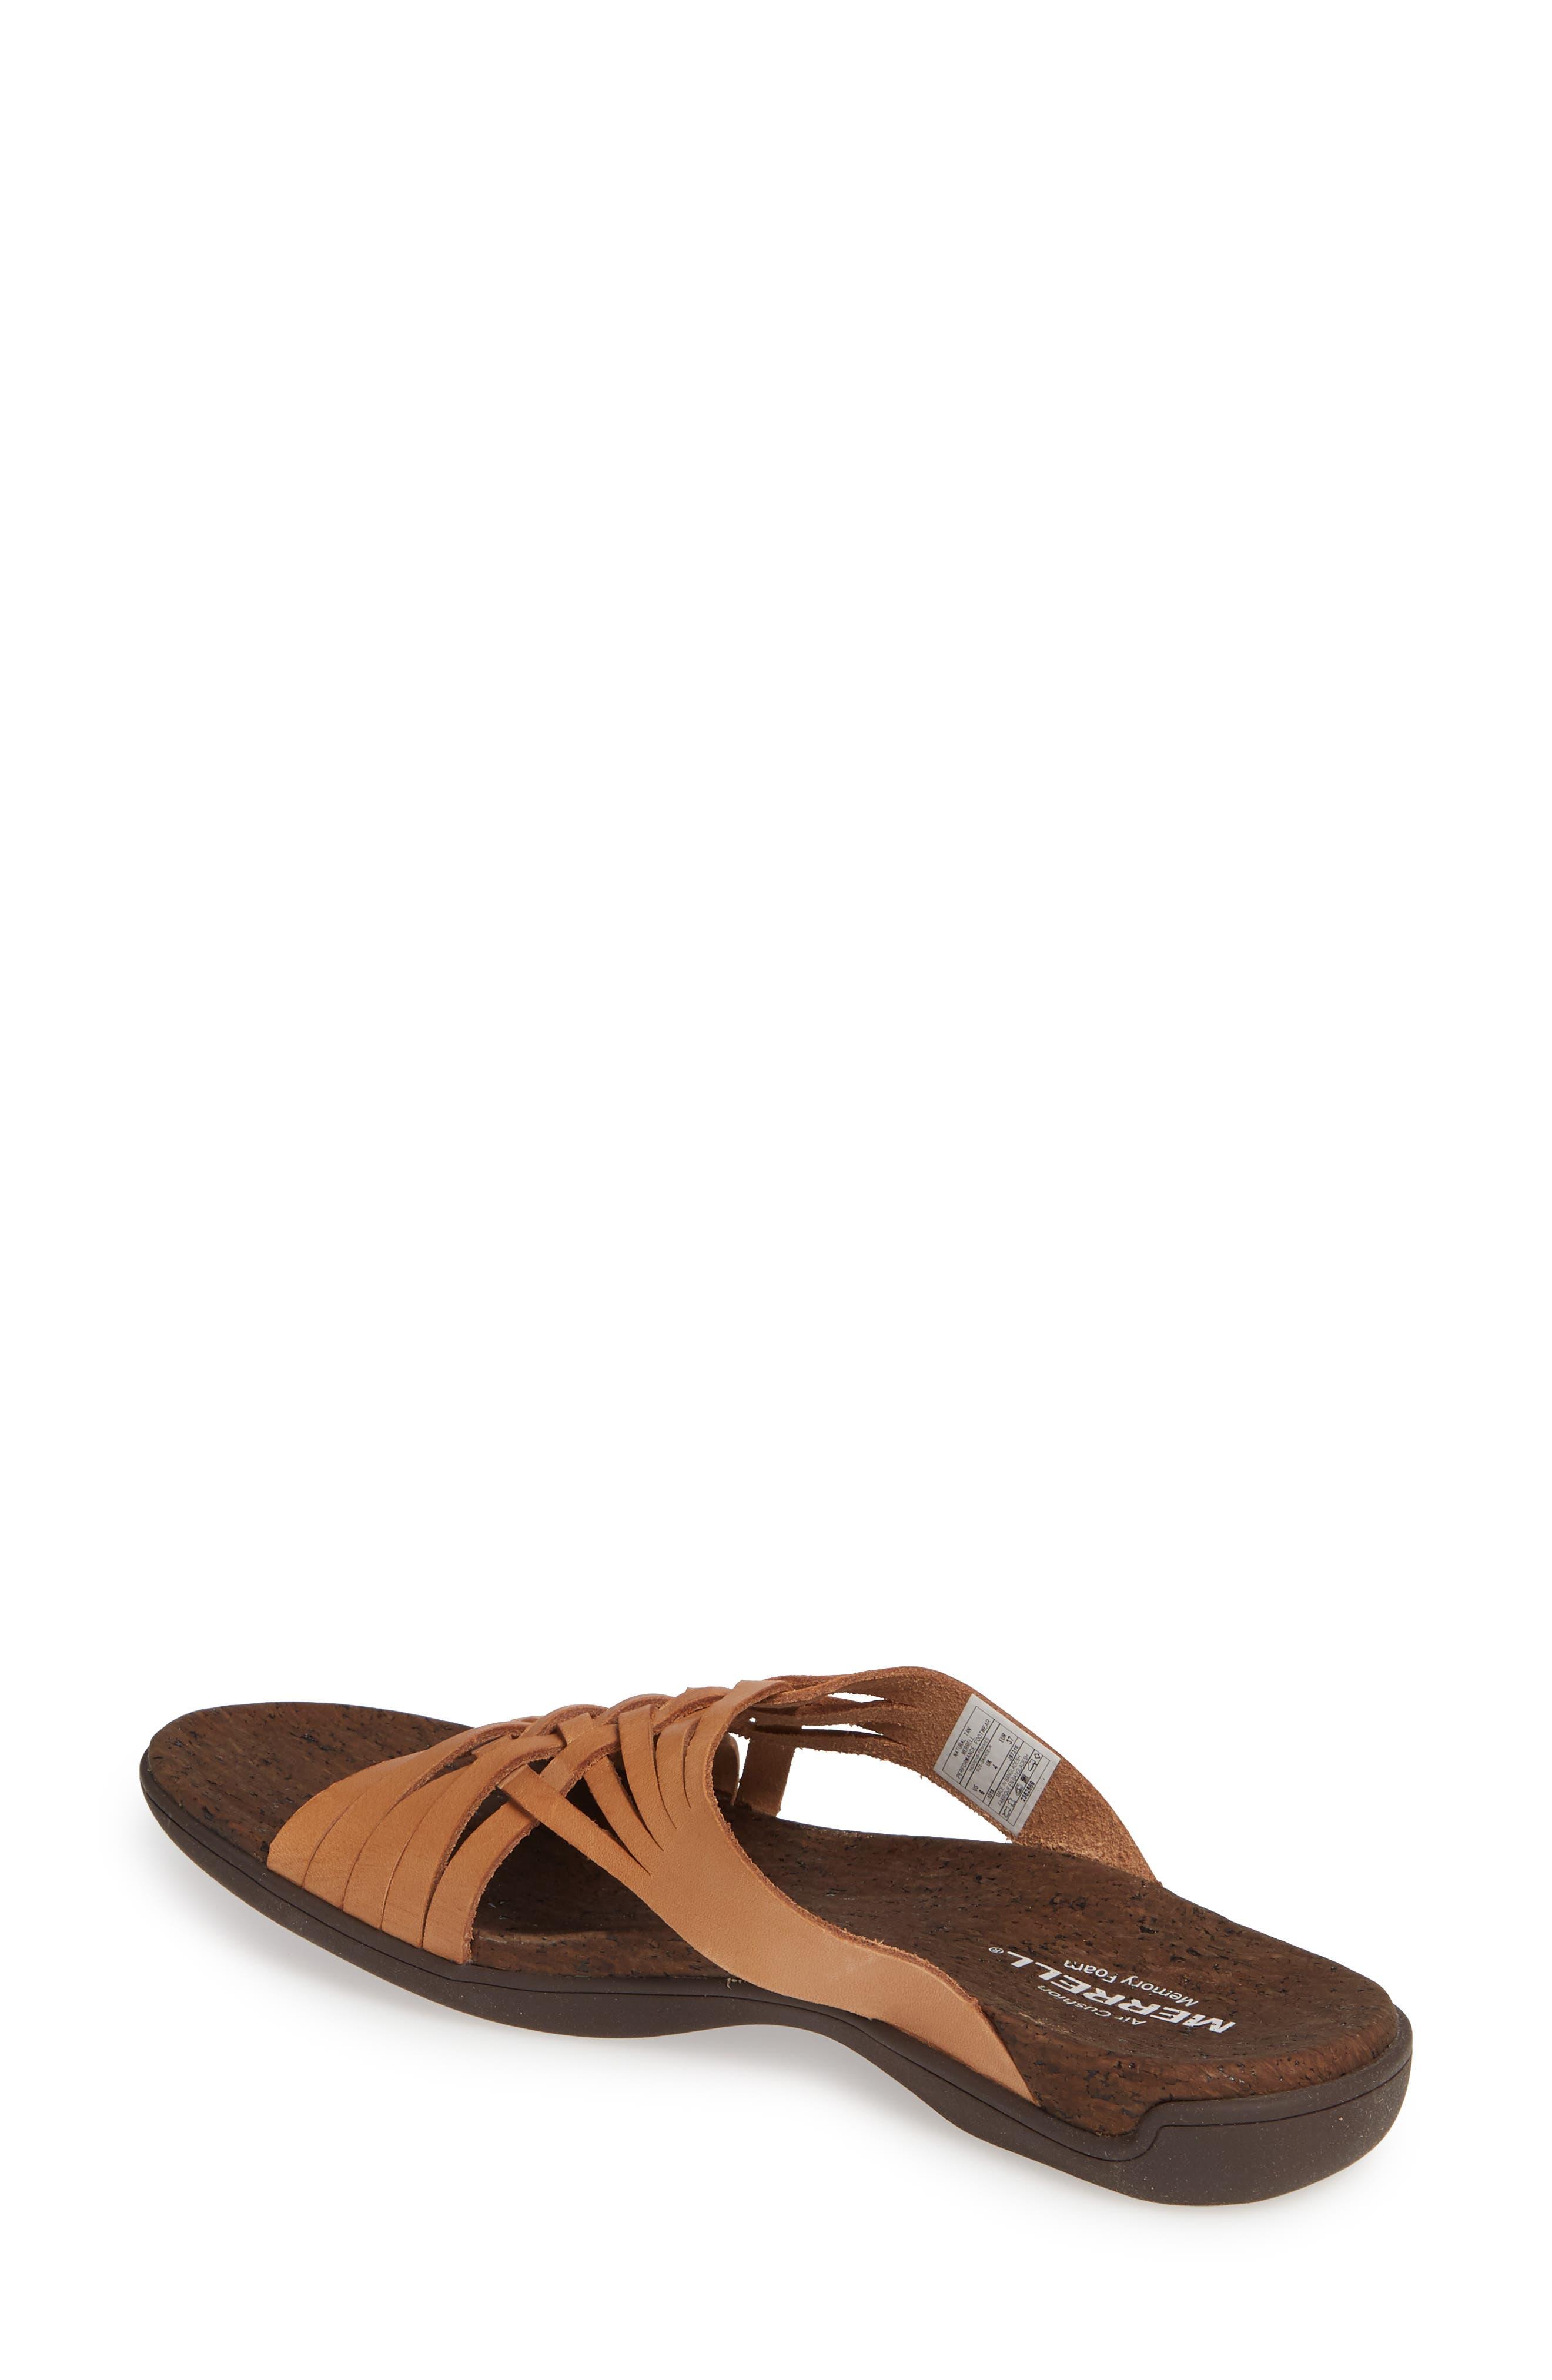 c5203ba0eb58 Women s Merrell Sandals